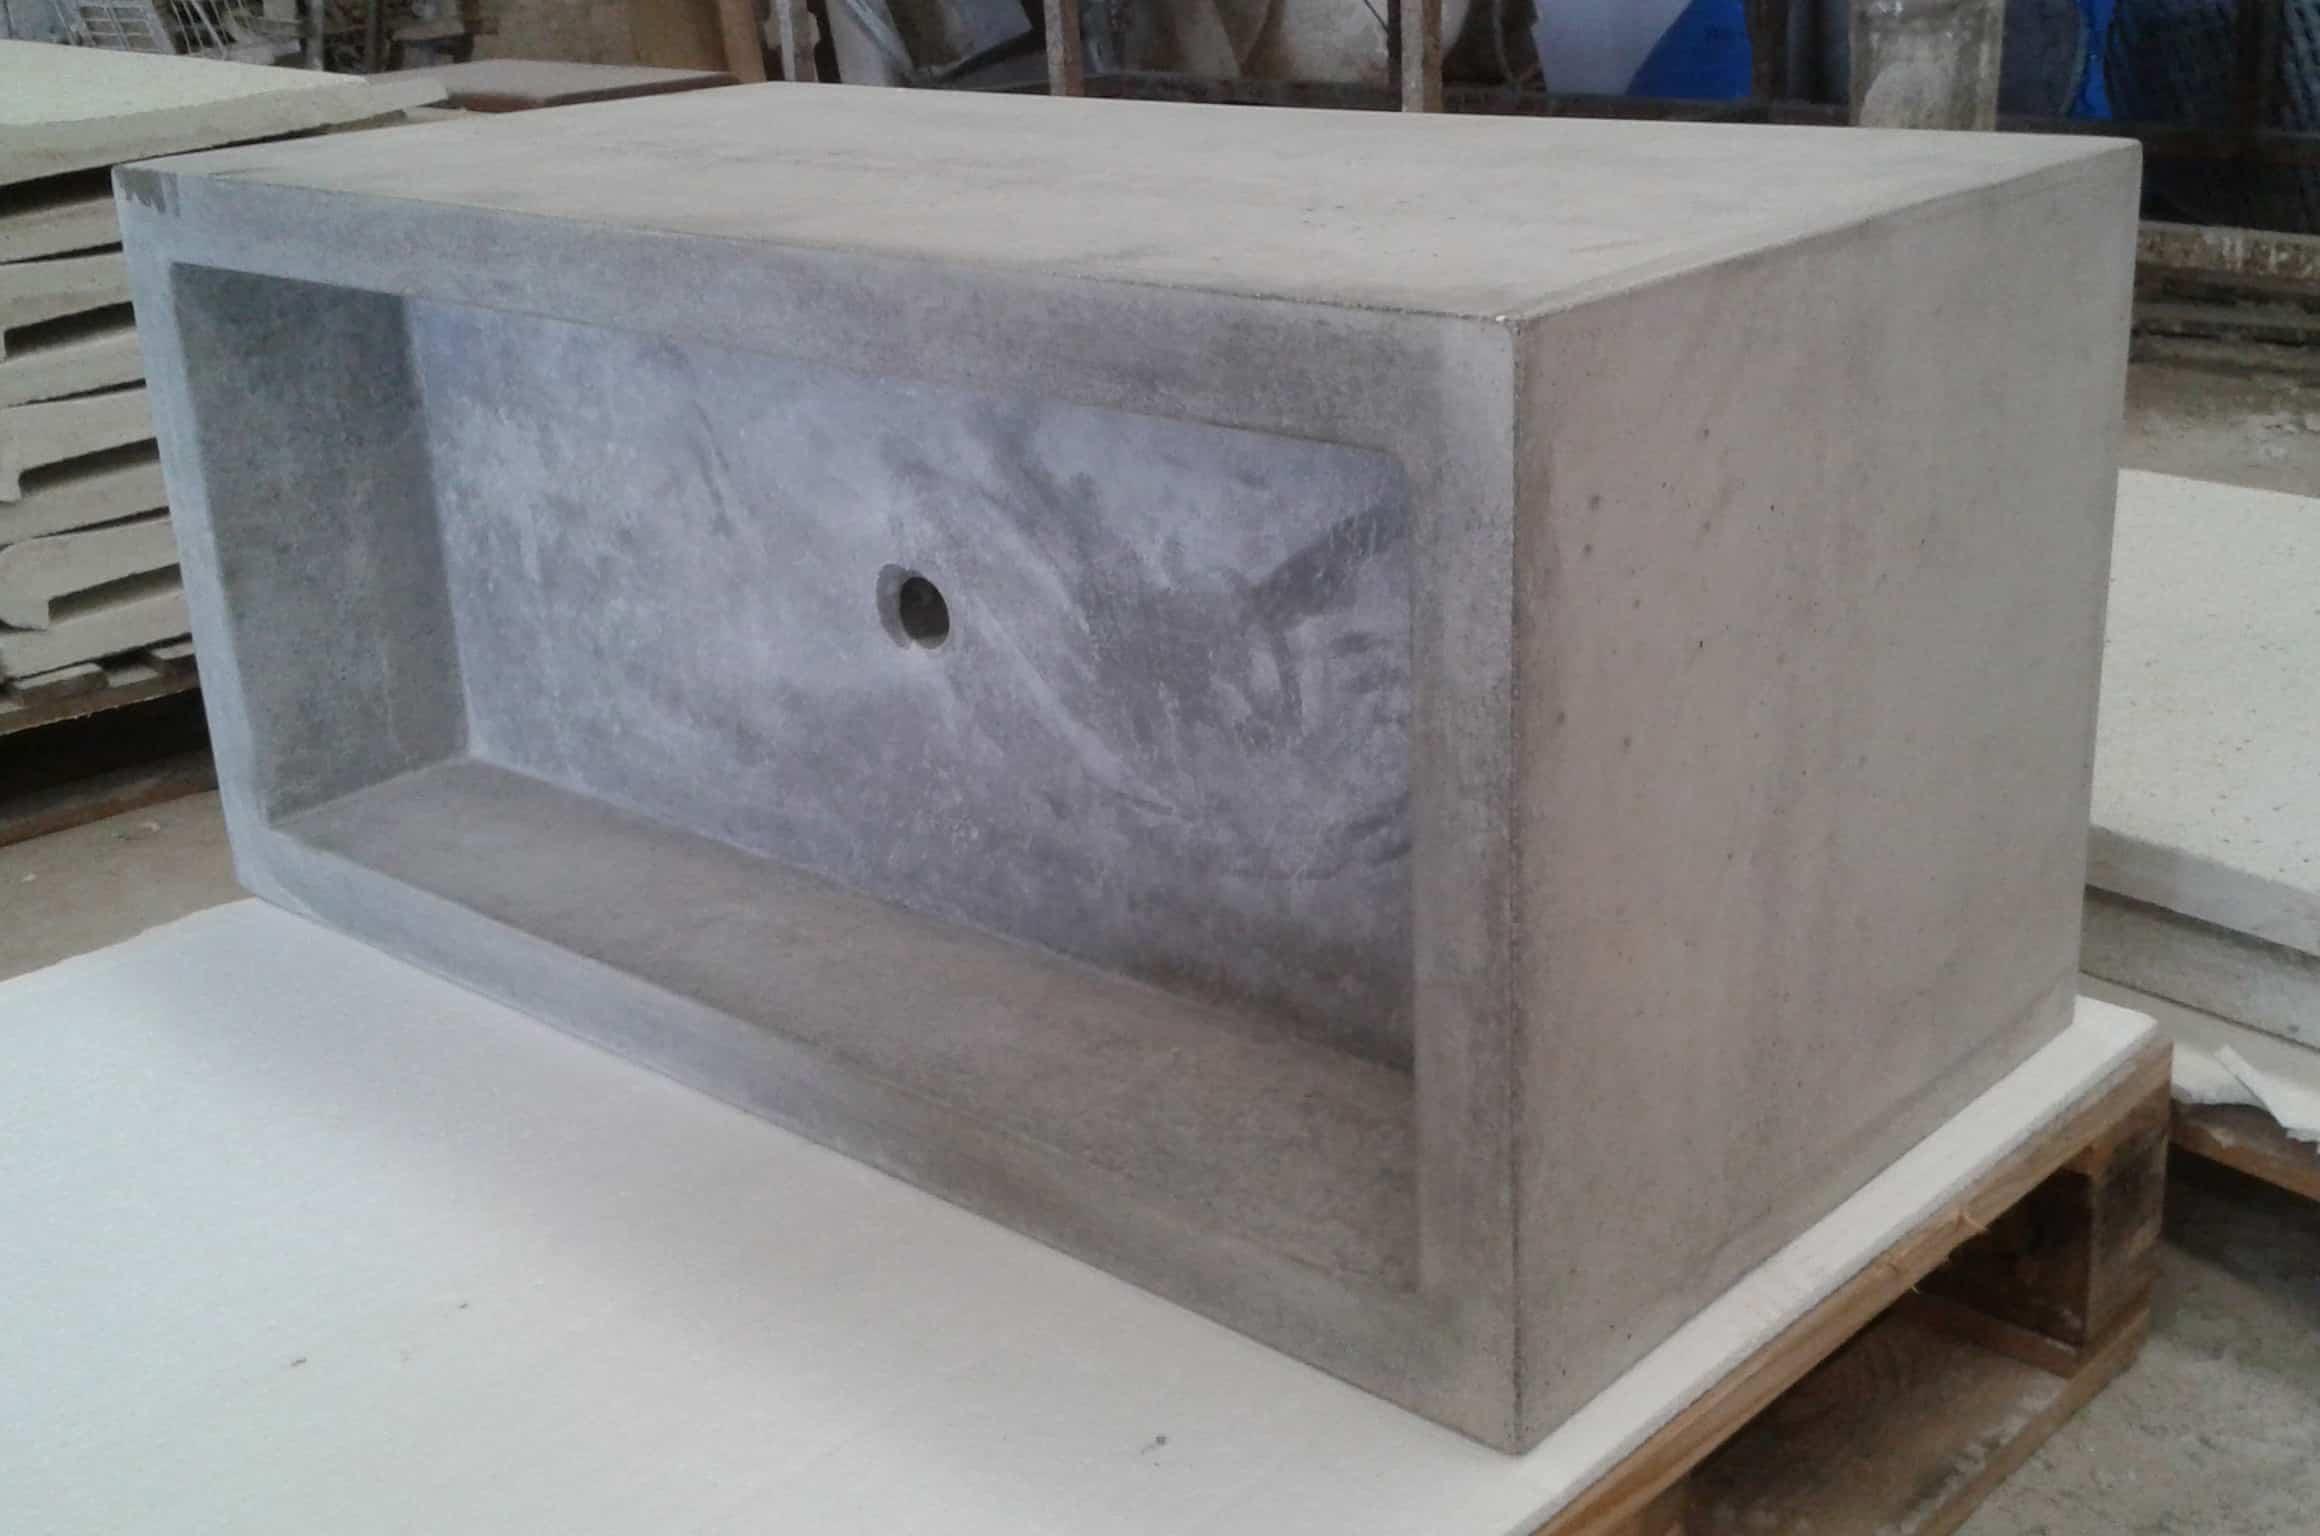 Lavabo Cemento | Lavabo Ceramica Rectangular Cielo Enjoy Terra Ceramica